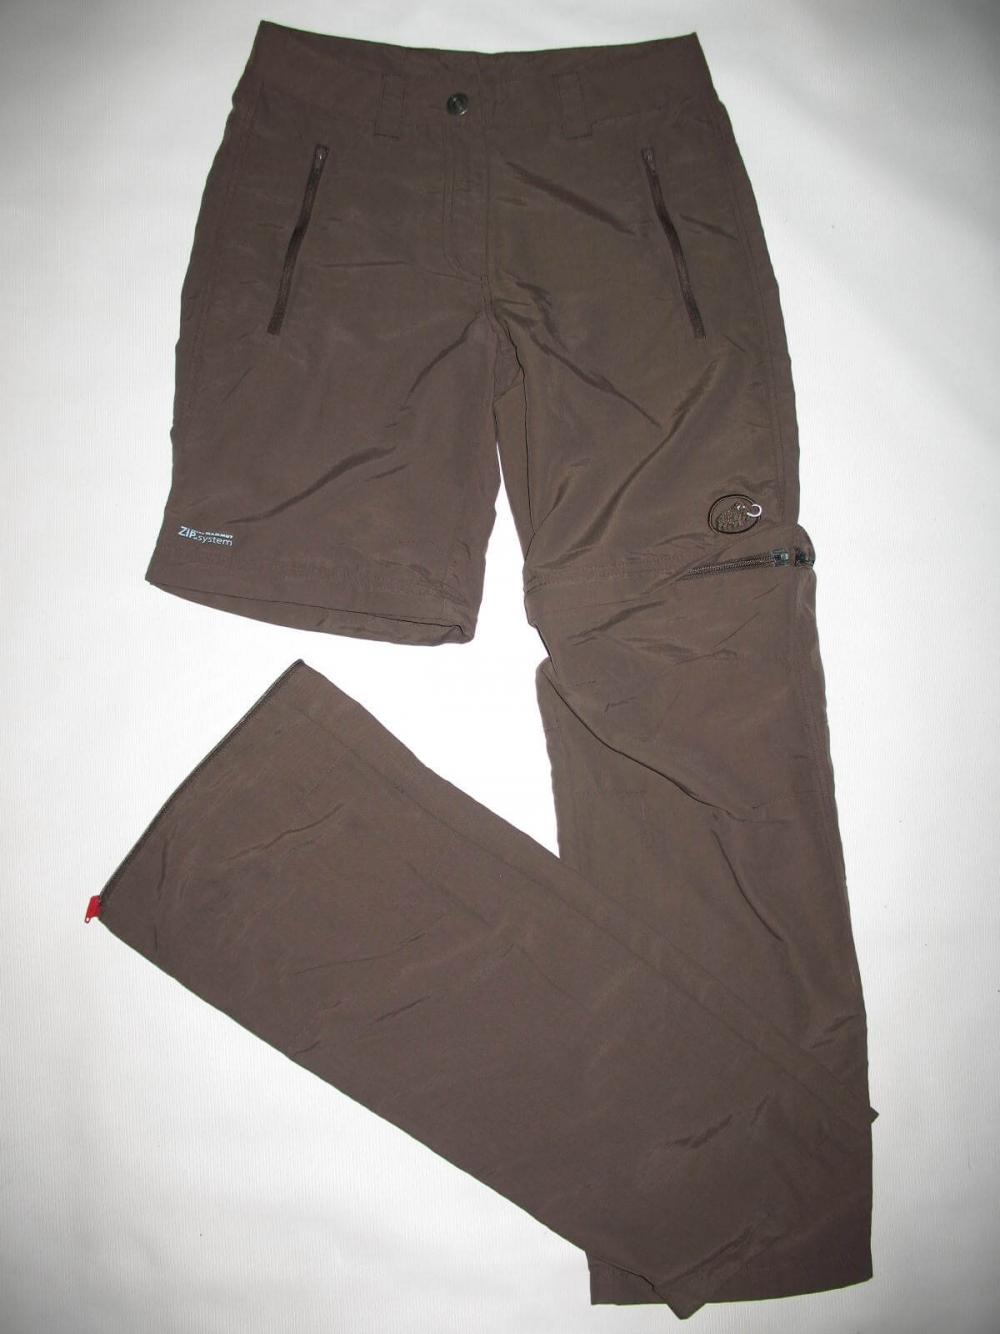 Штаны MAMMUT Zip Off brown pants lady (размер S/XS) - 4